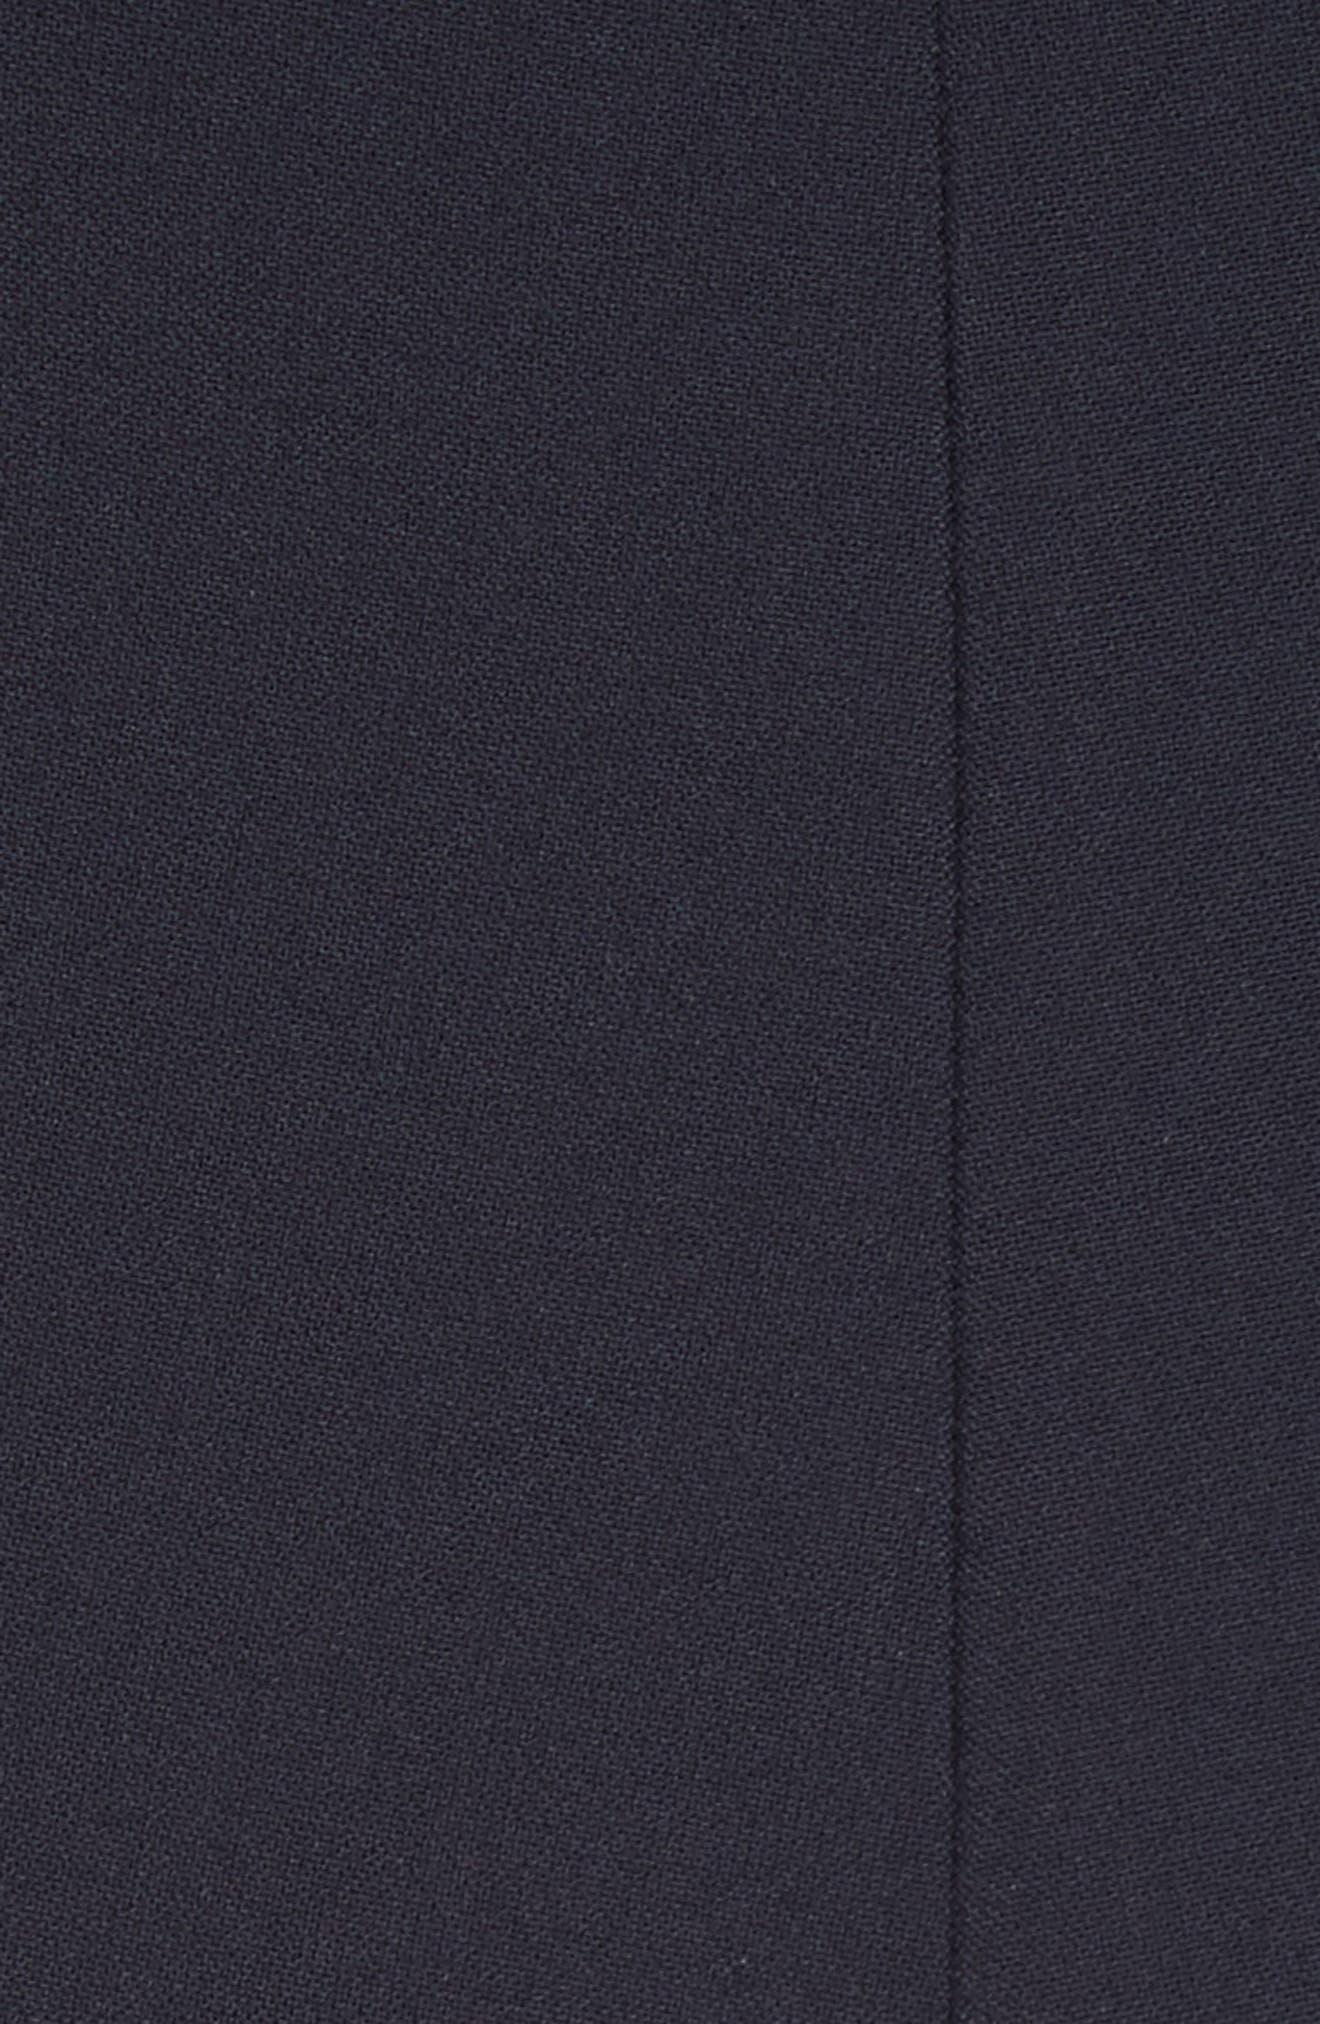 Foldover One Shoulder Jumpsuit,                             Alternate thumbnail 5, color,